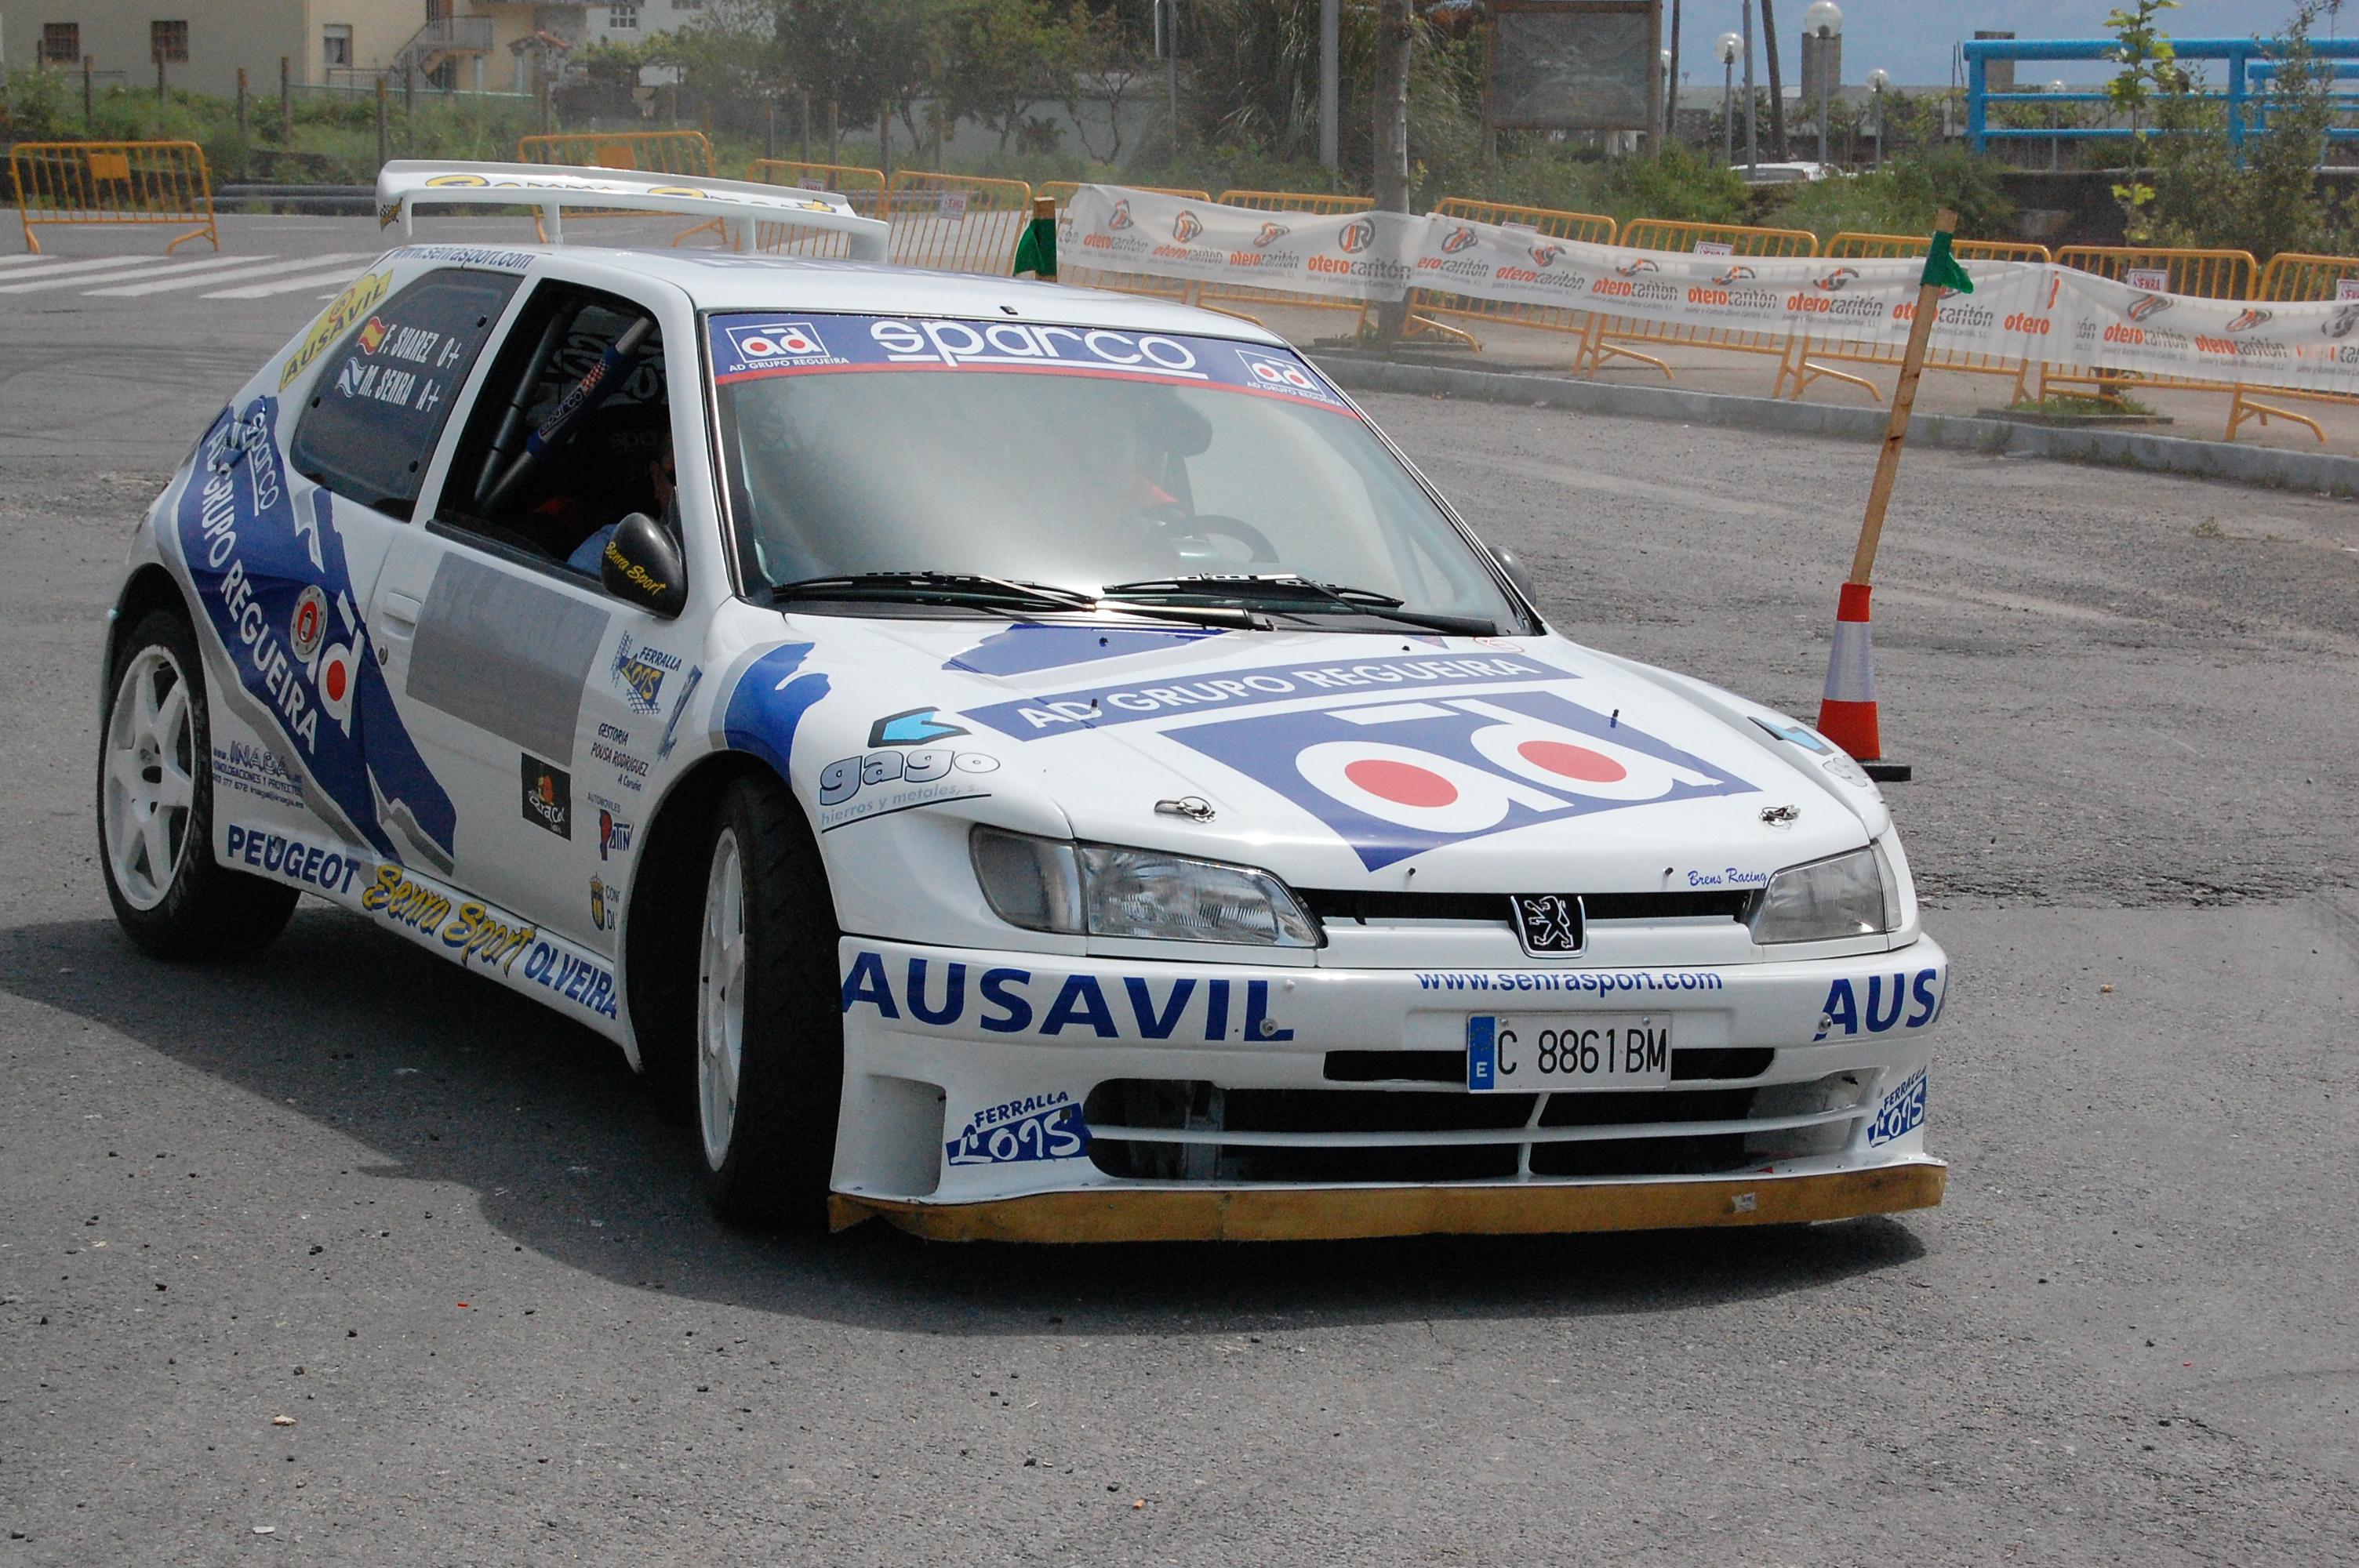 Peugeot_306_Kit_Car._Manuel_Senra.jpg